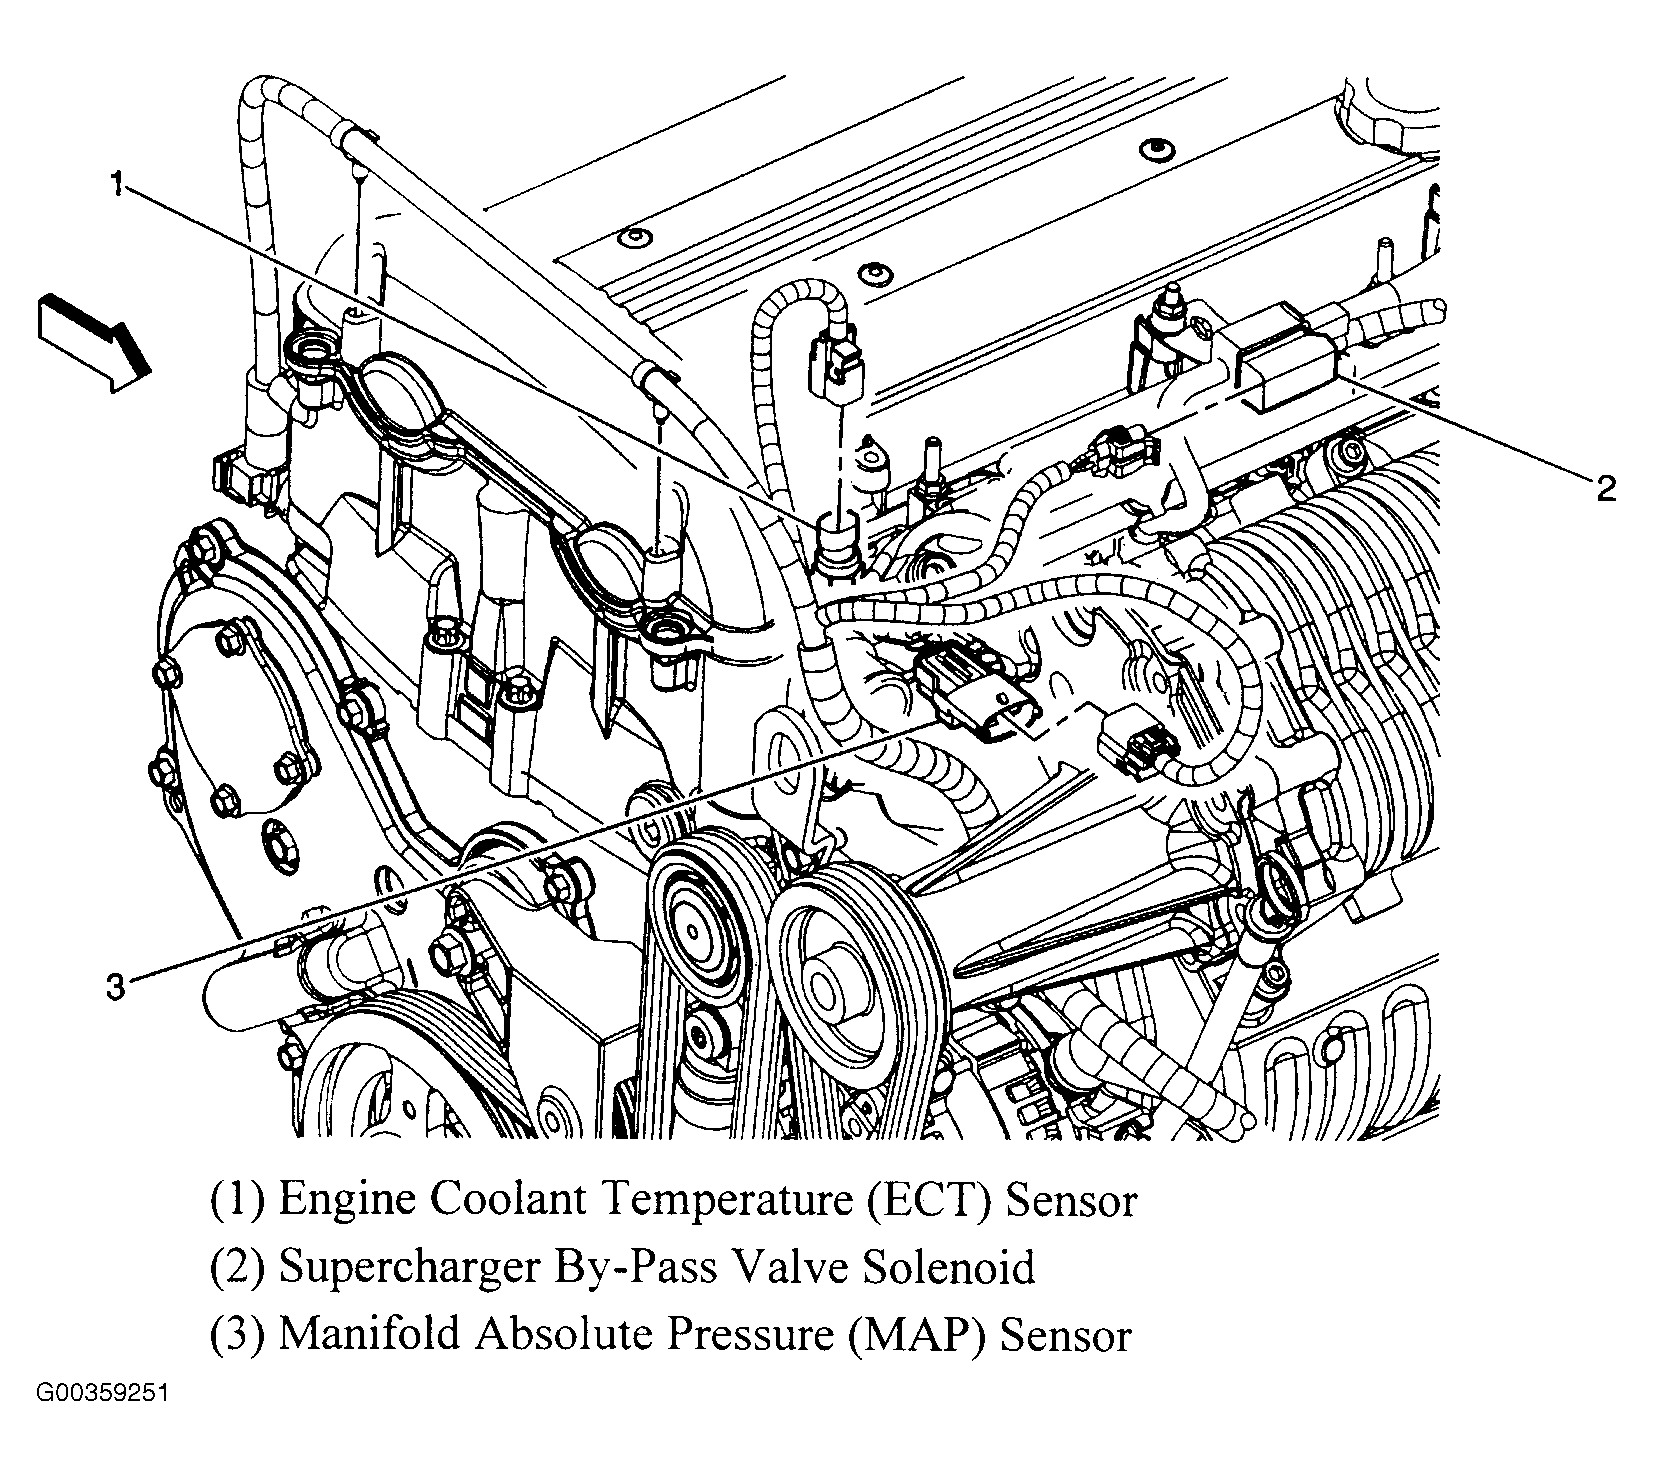 2004 saturn ion 2 fuse box location 2005 saturn ion wiring diagrams wiring diagram data  2005 saturn ion wiring diagrams